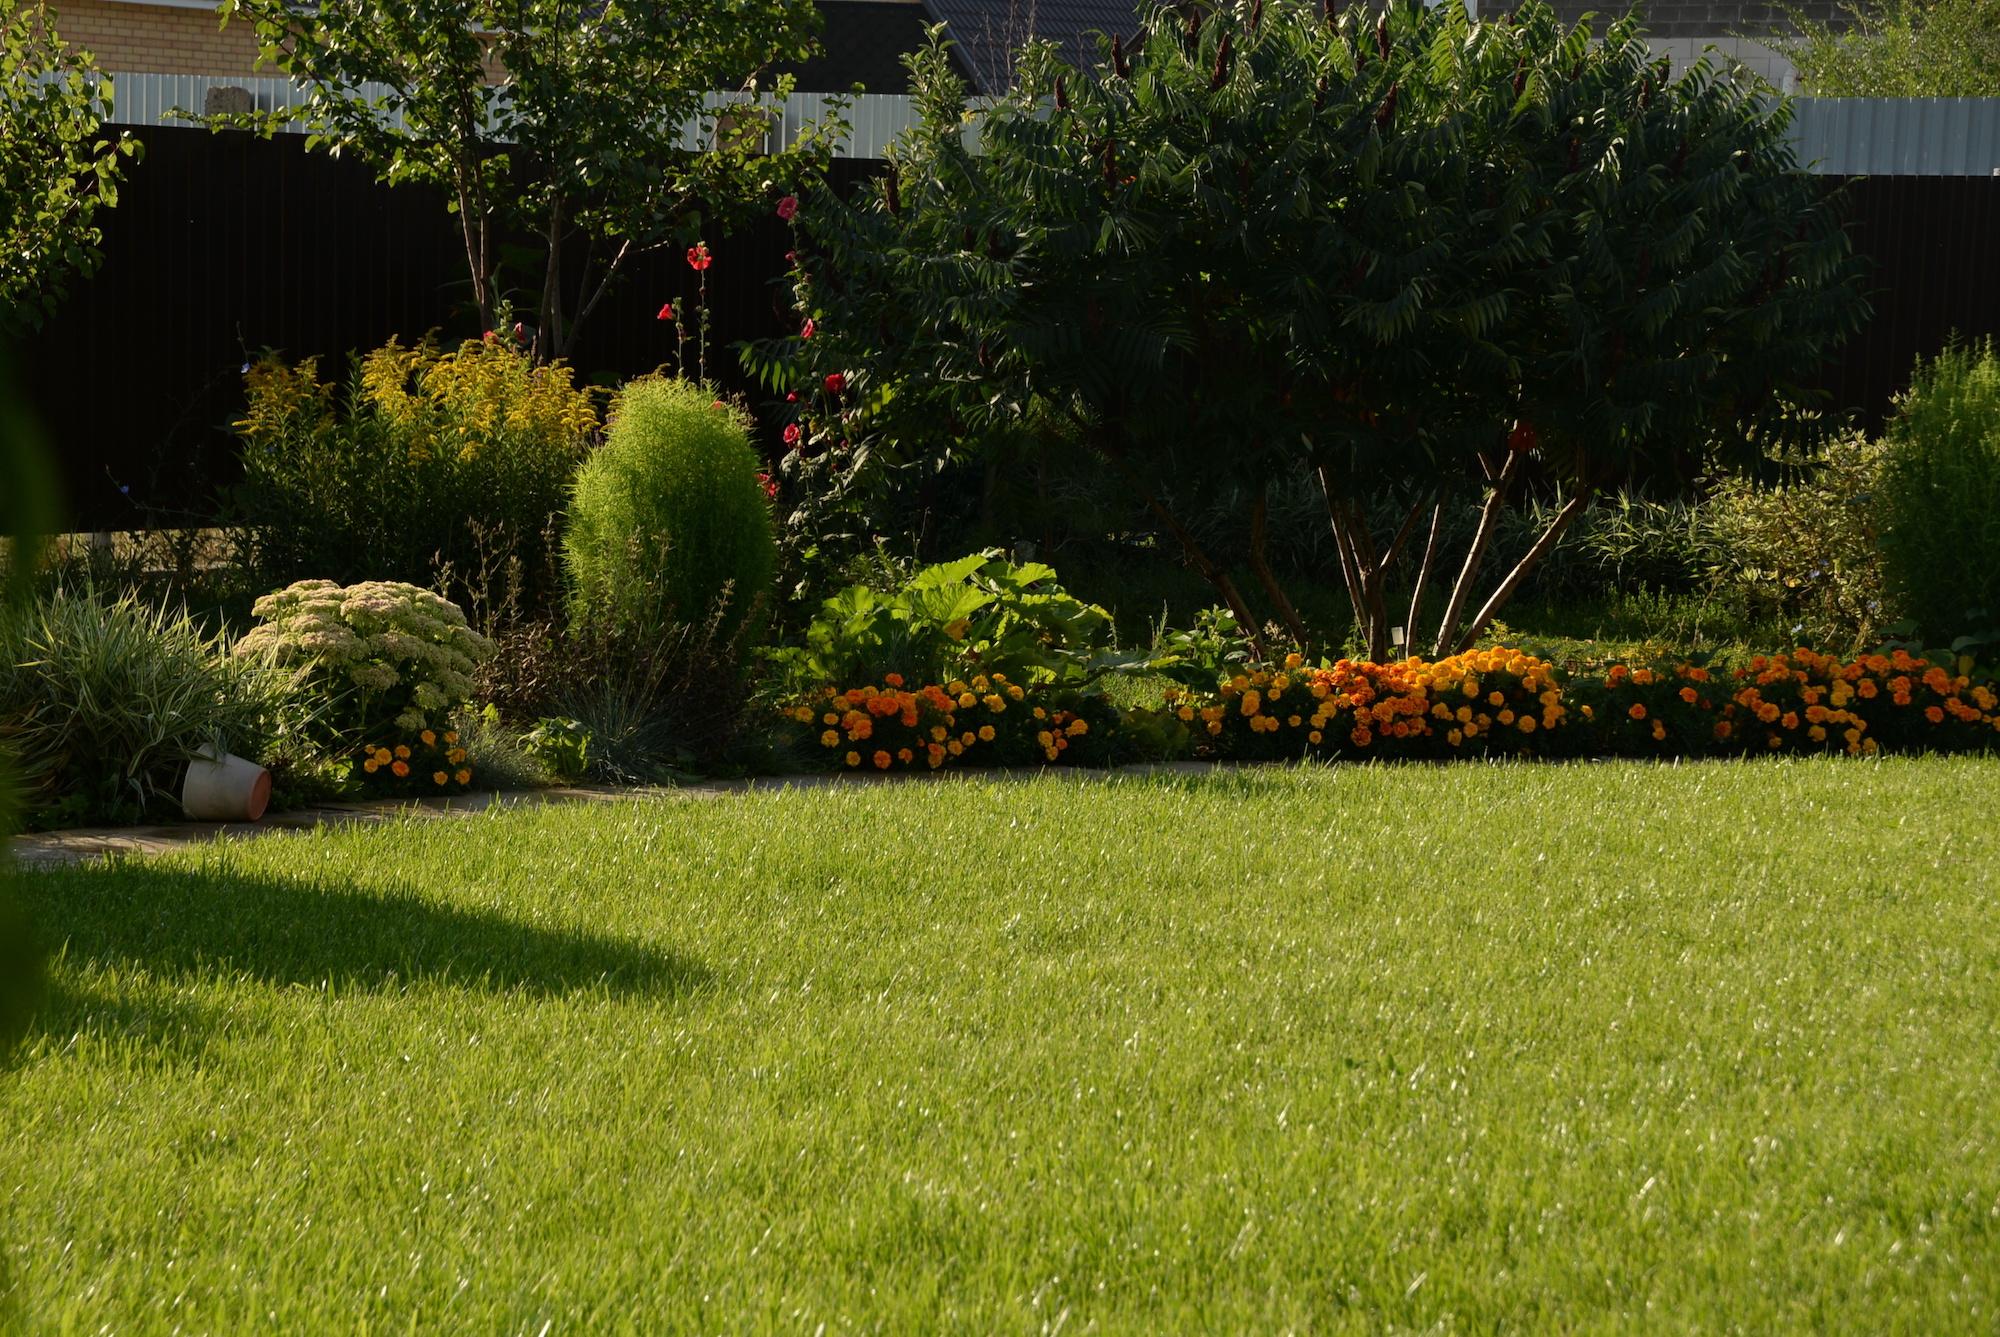 green grass, lawn in the garden